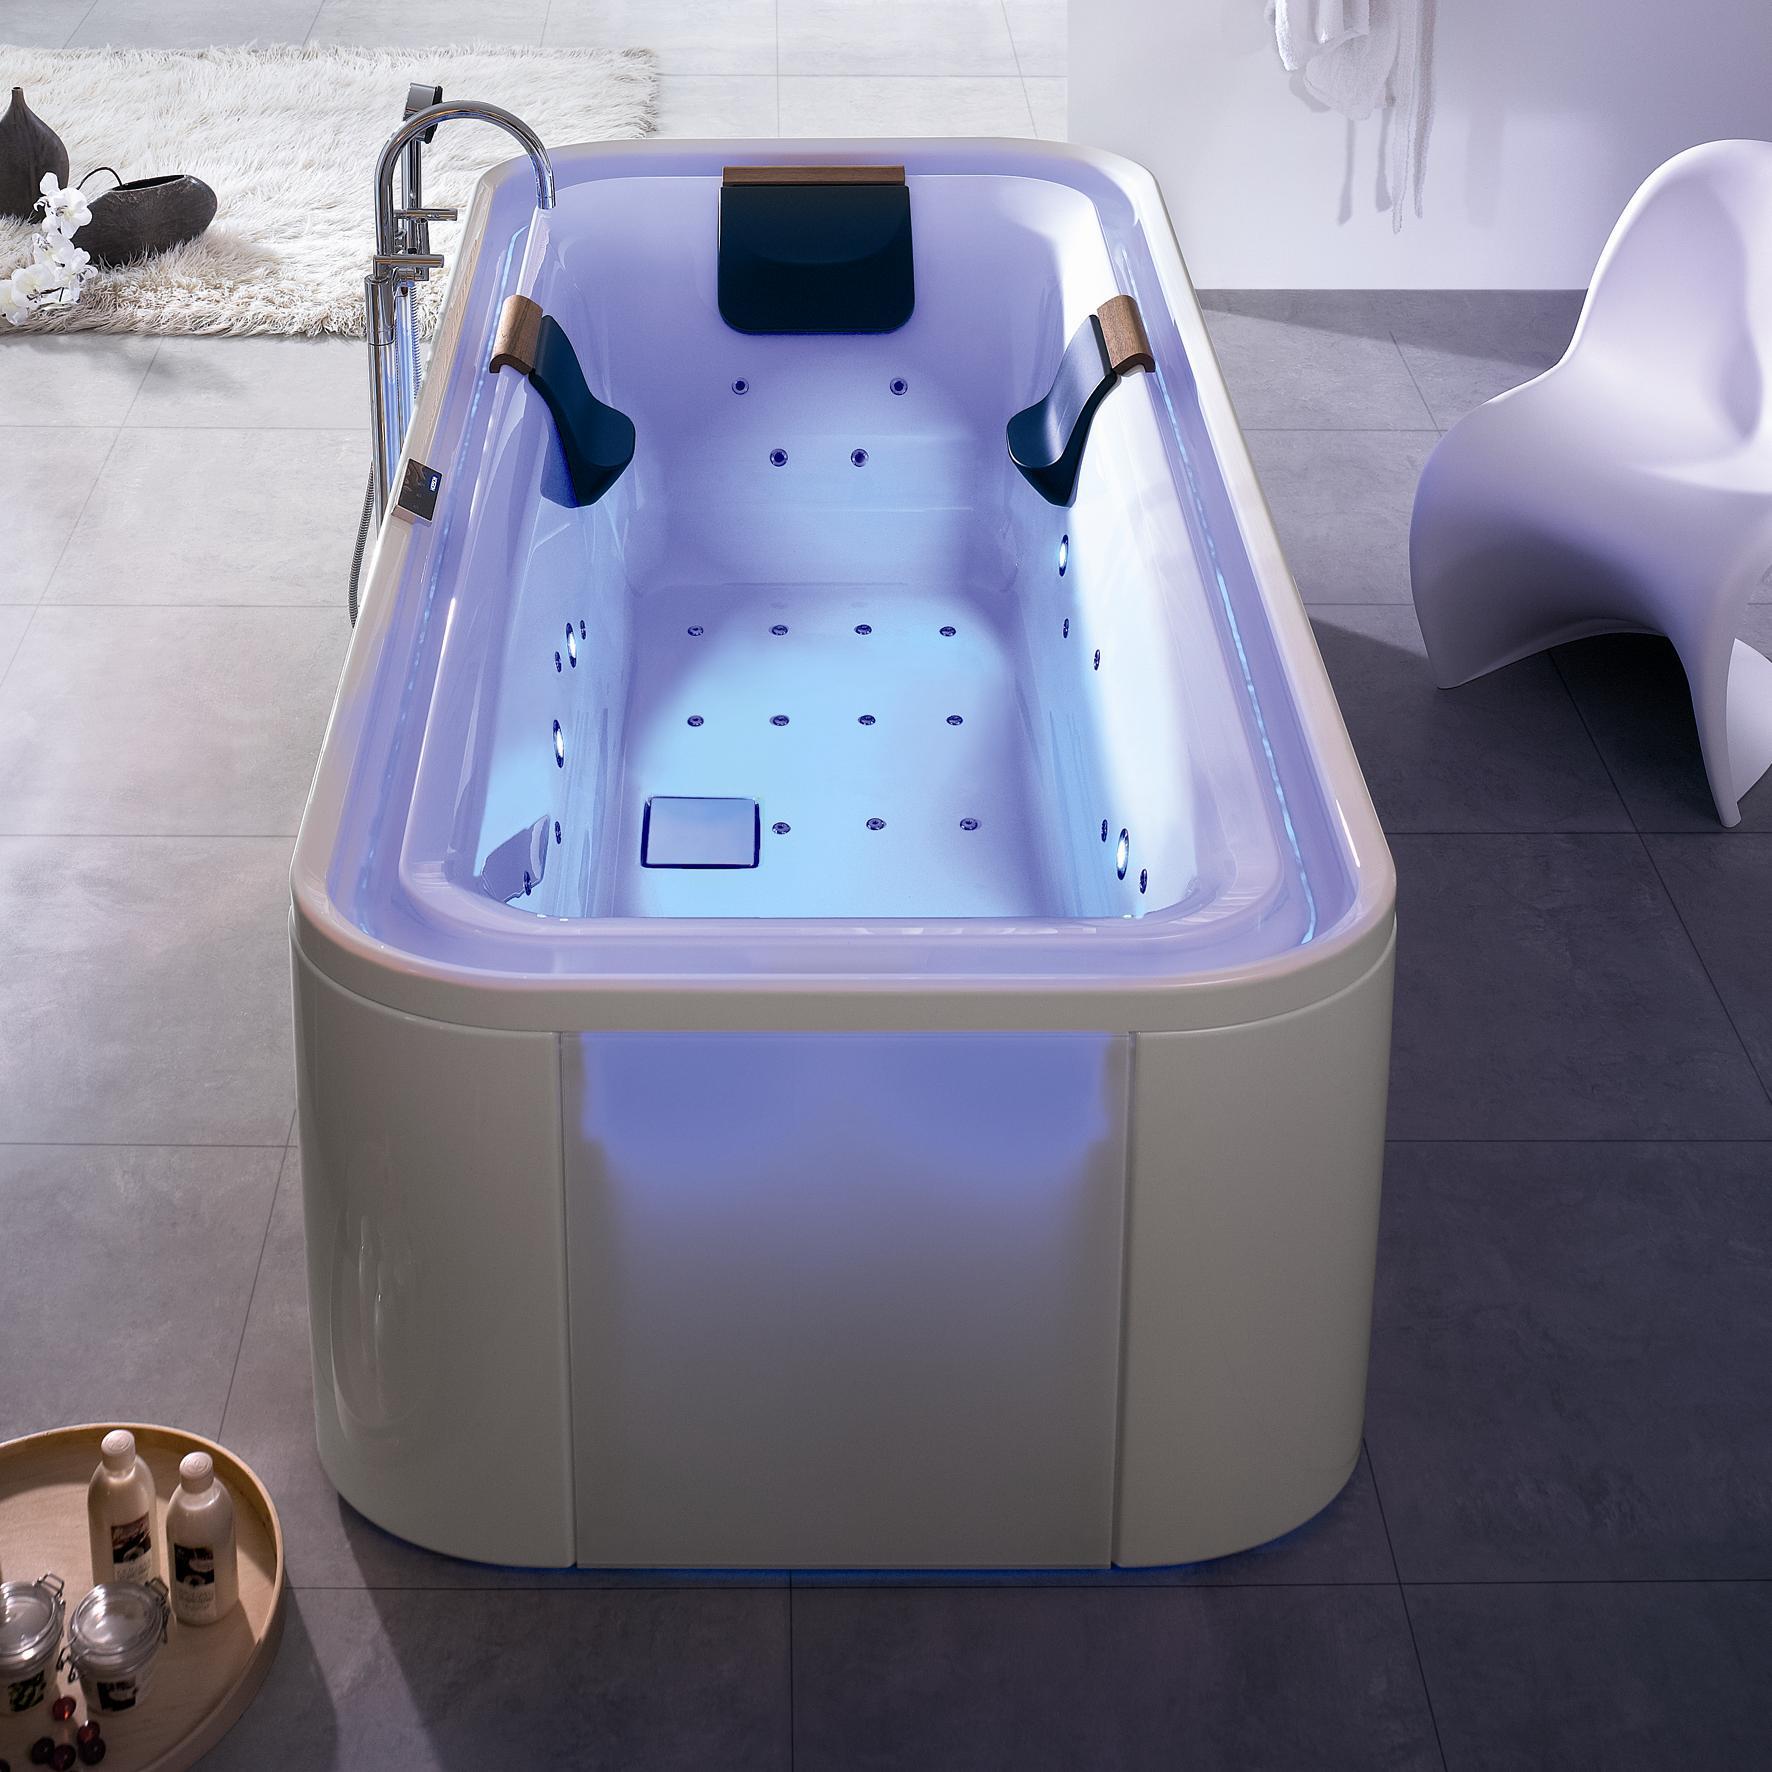 Габаритная ванна джакузи